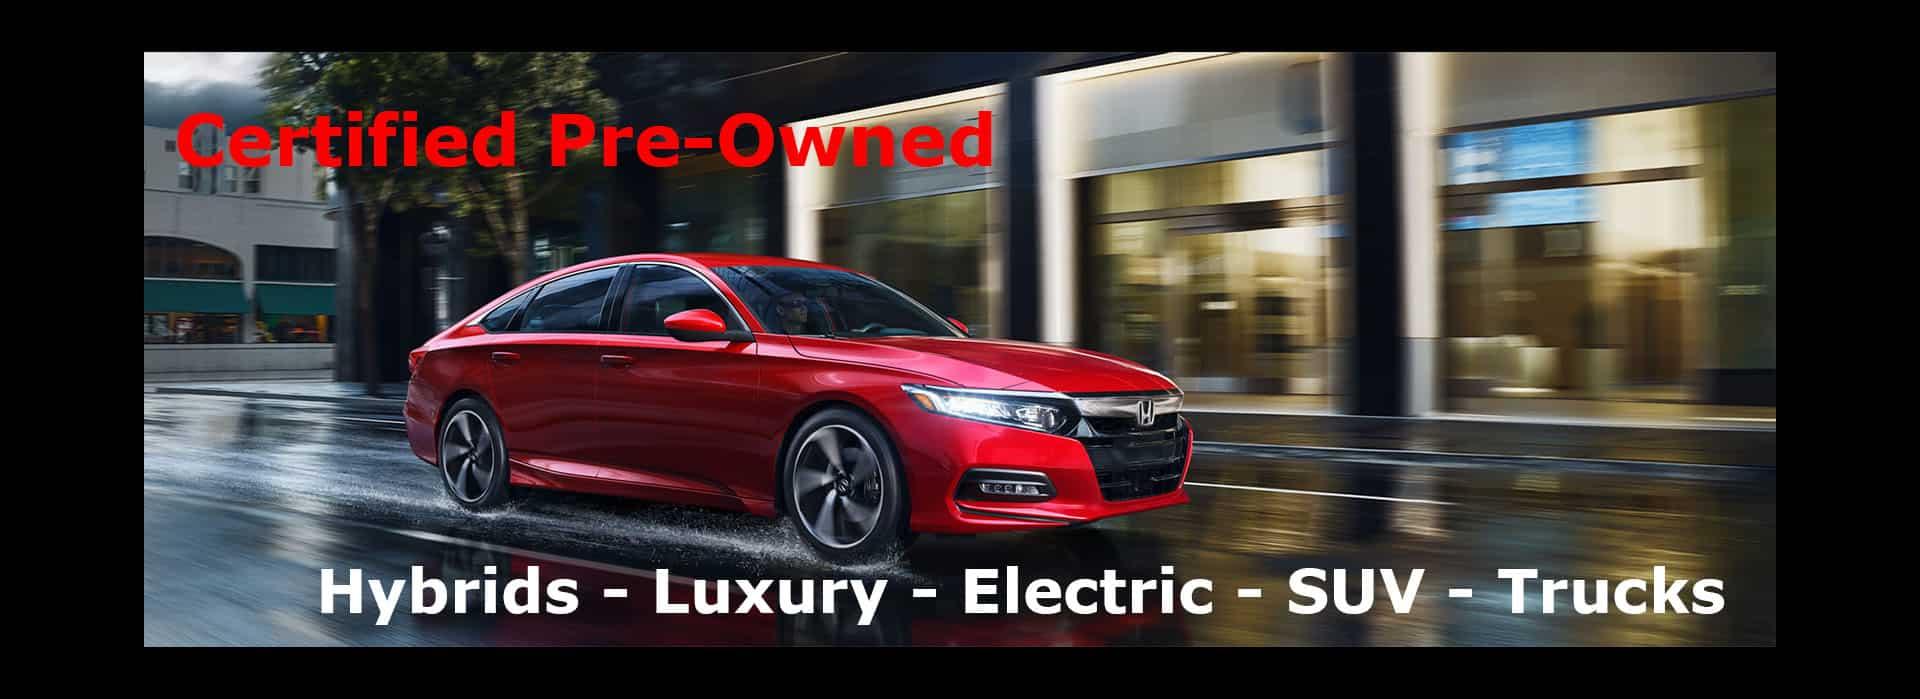 Certified Pre-Owned Hybrids, Luxury, SUV, Trucks in Orange County